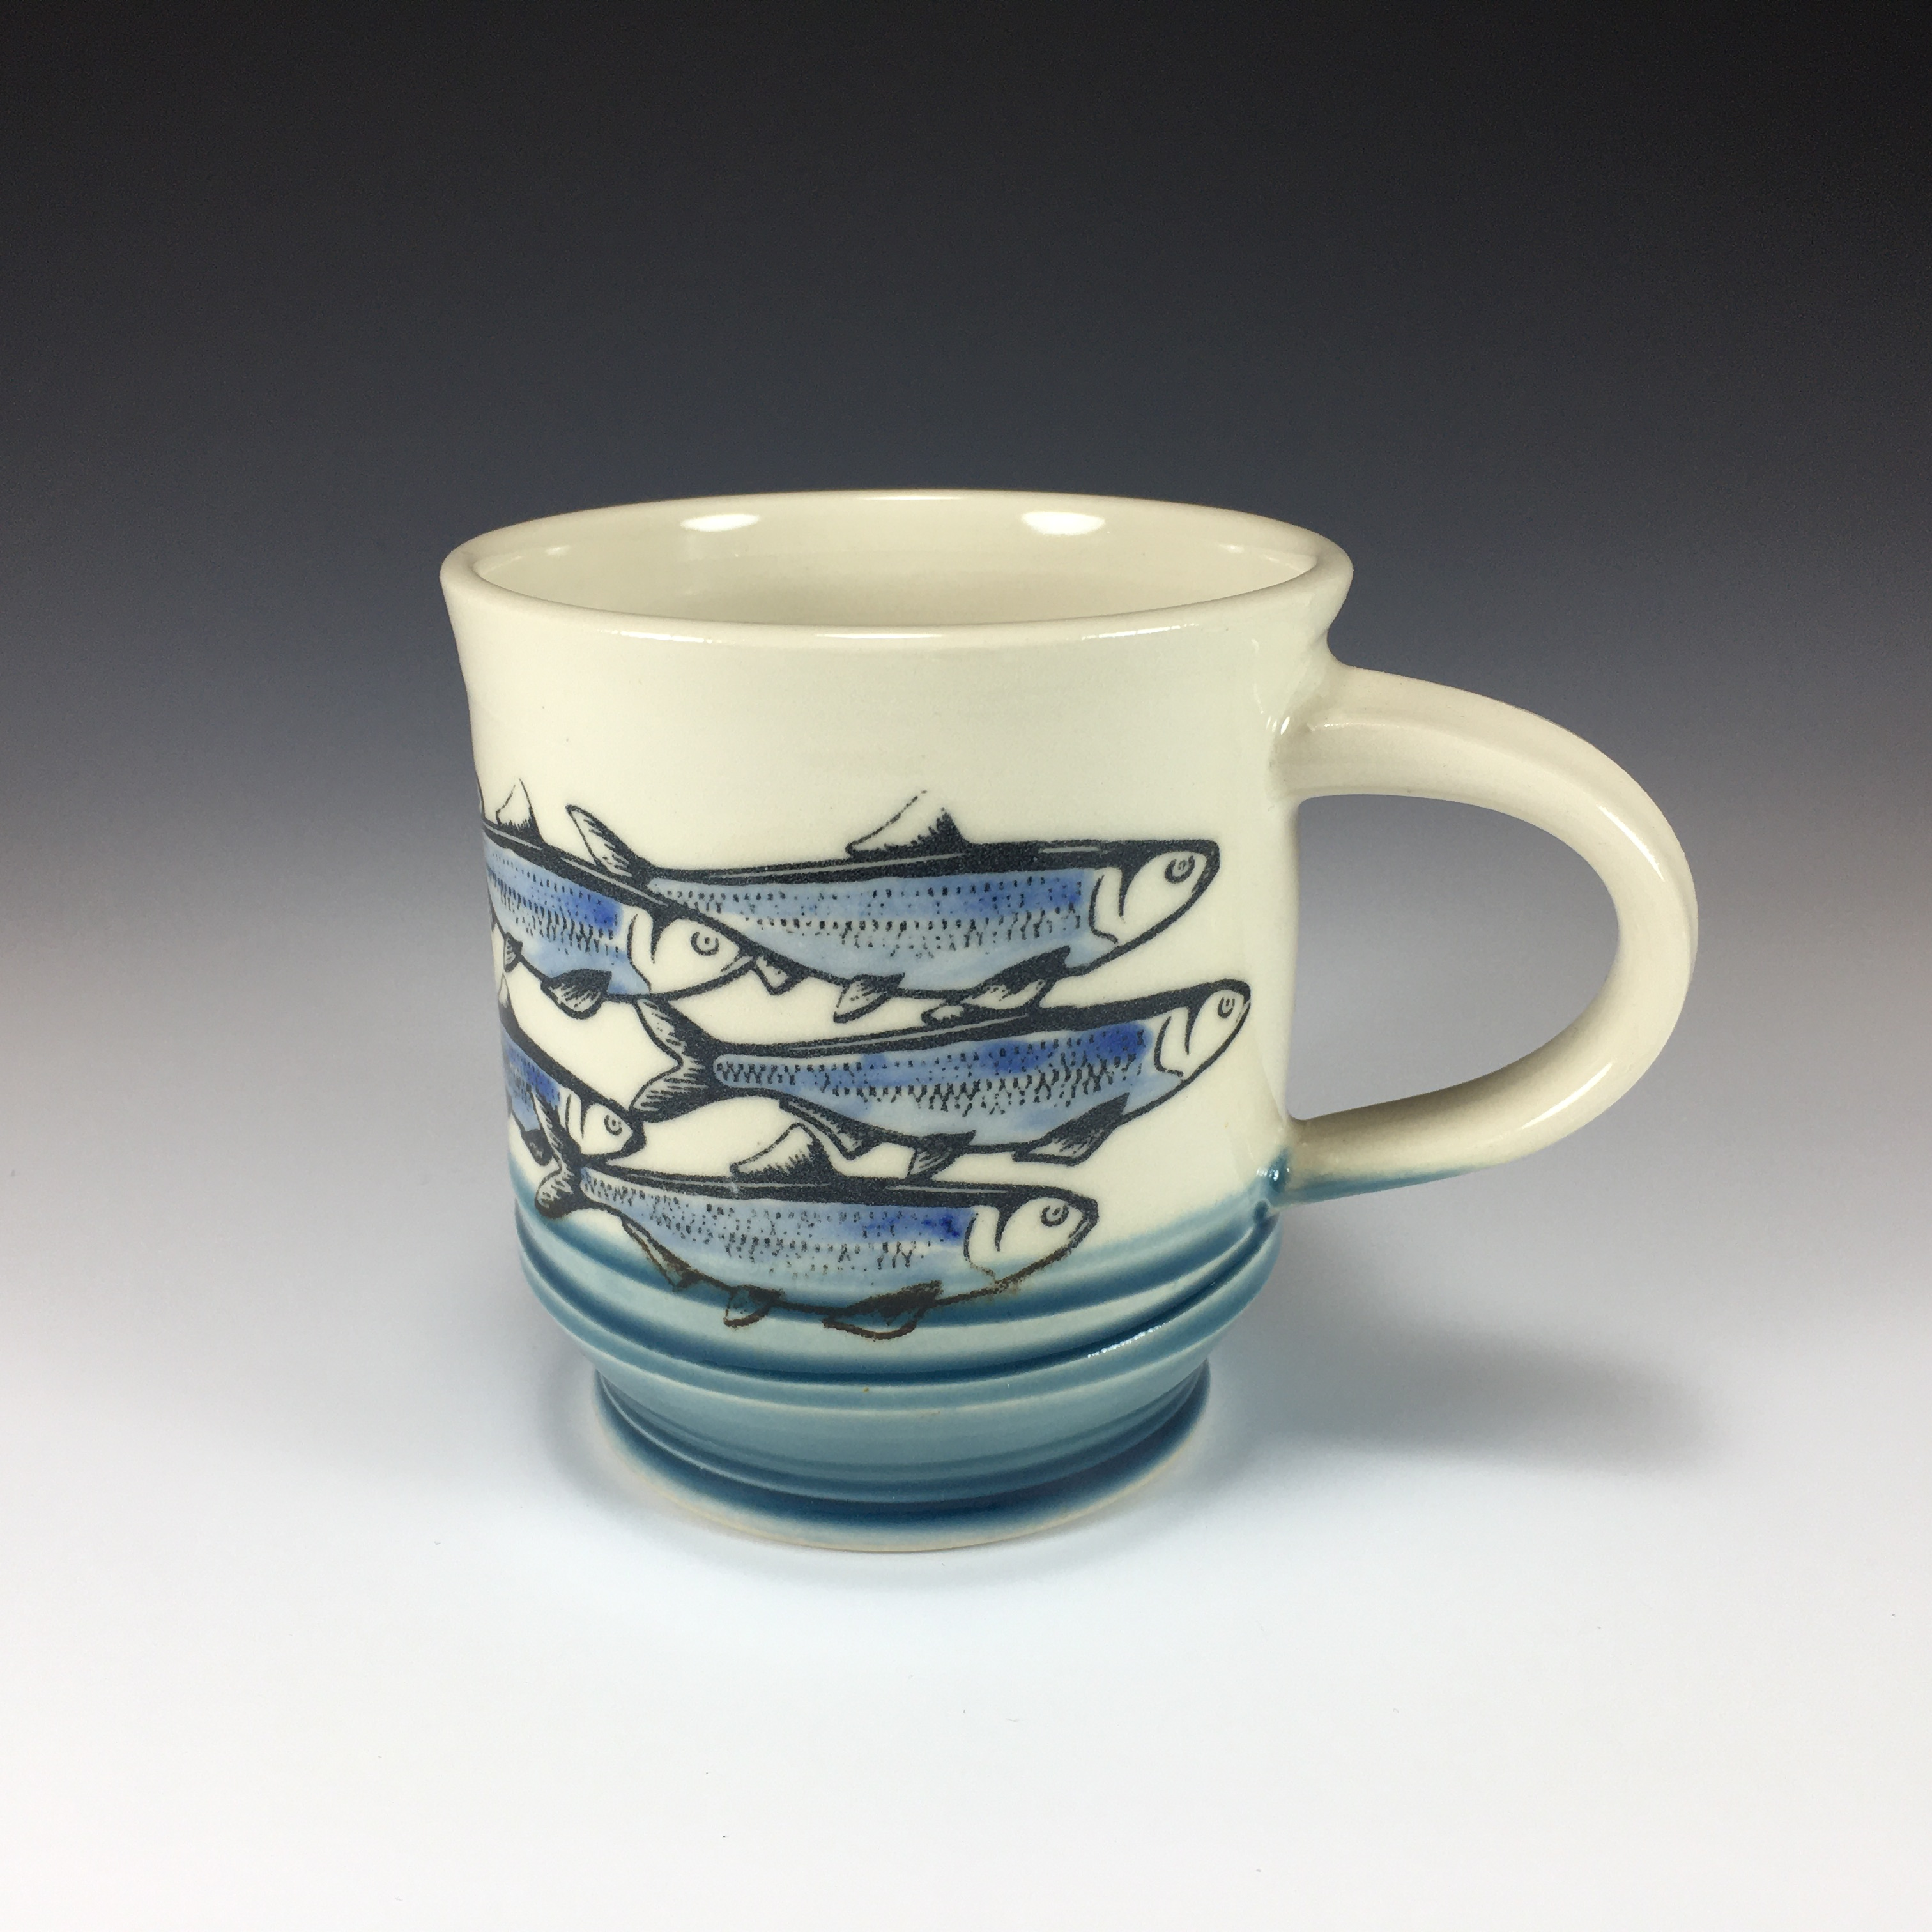 Herring Mug